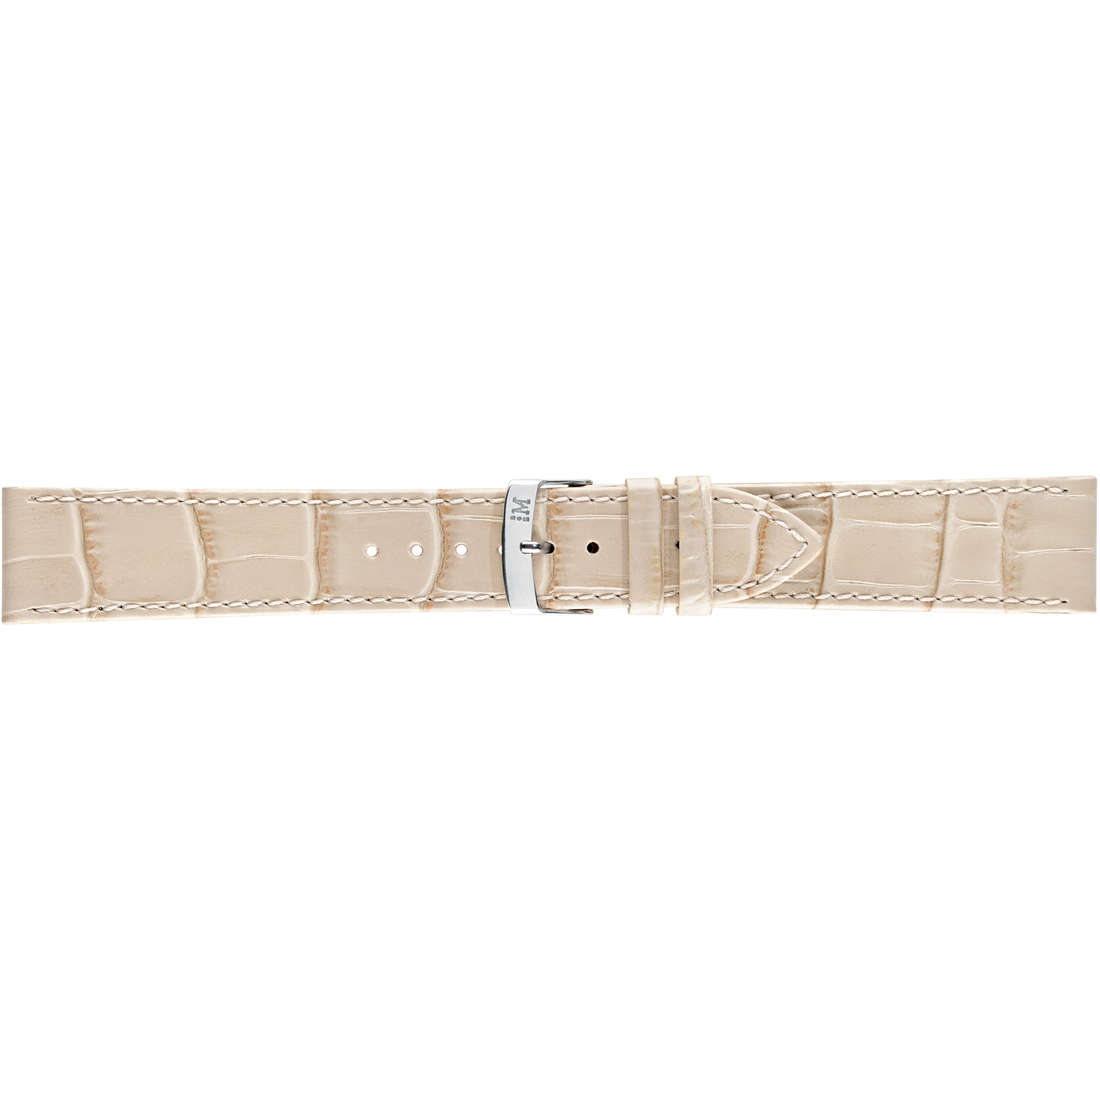 montre bande de montres homme Morellato Performance A01X2524656326CR20